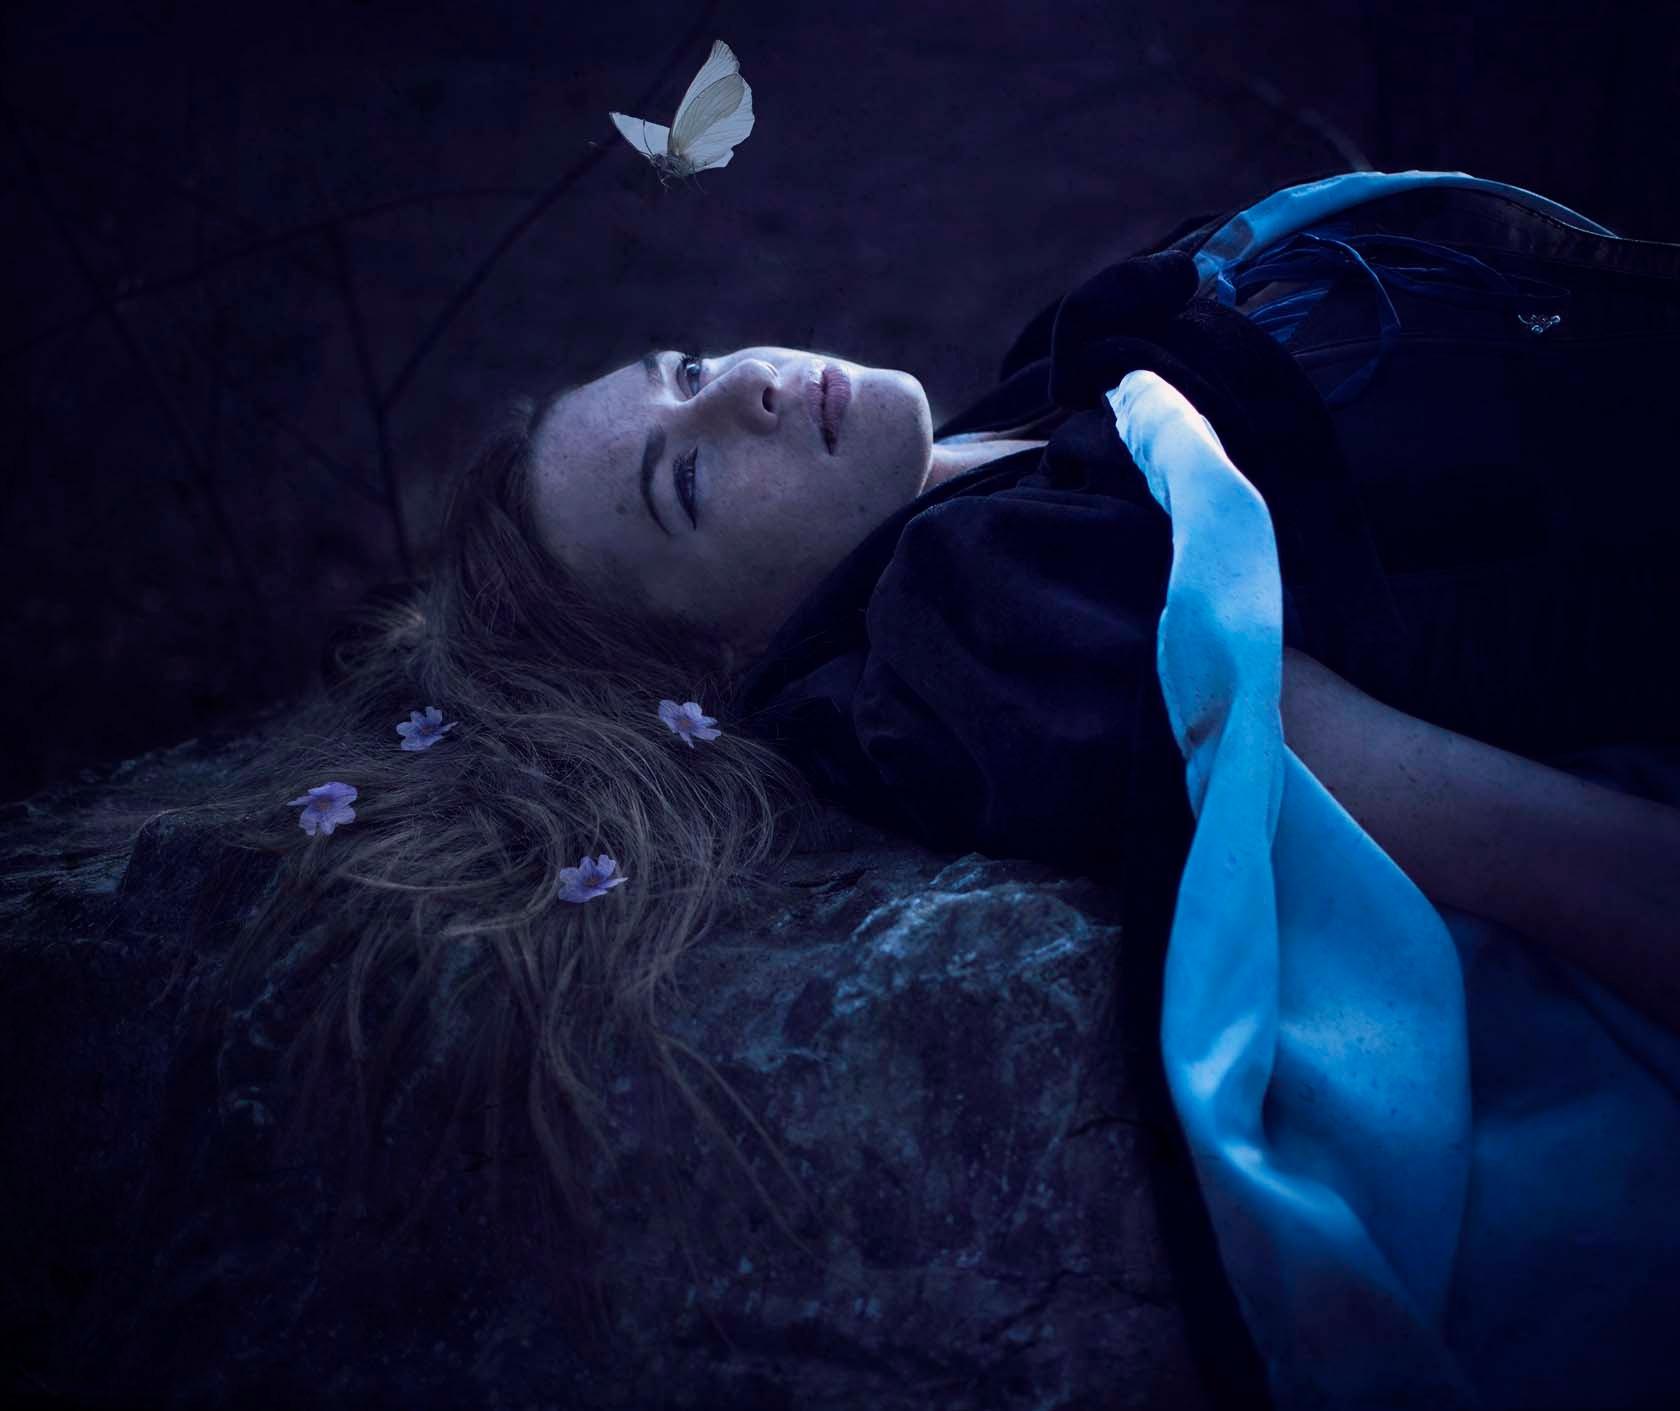 In the Stillness by BamajowenPhotography